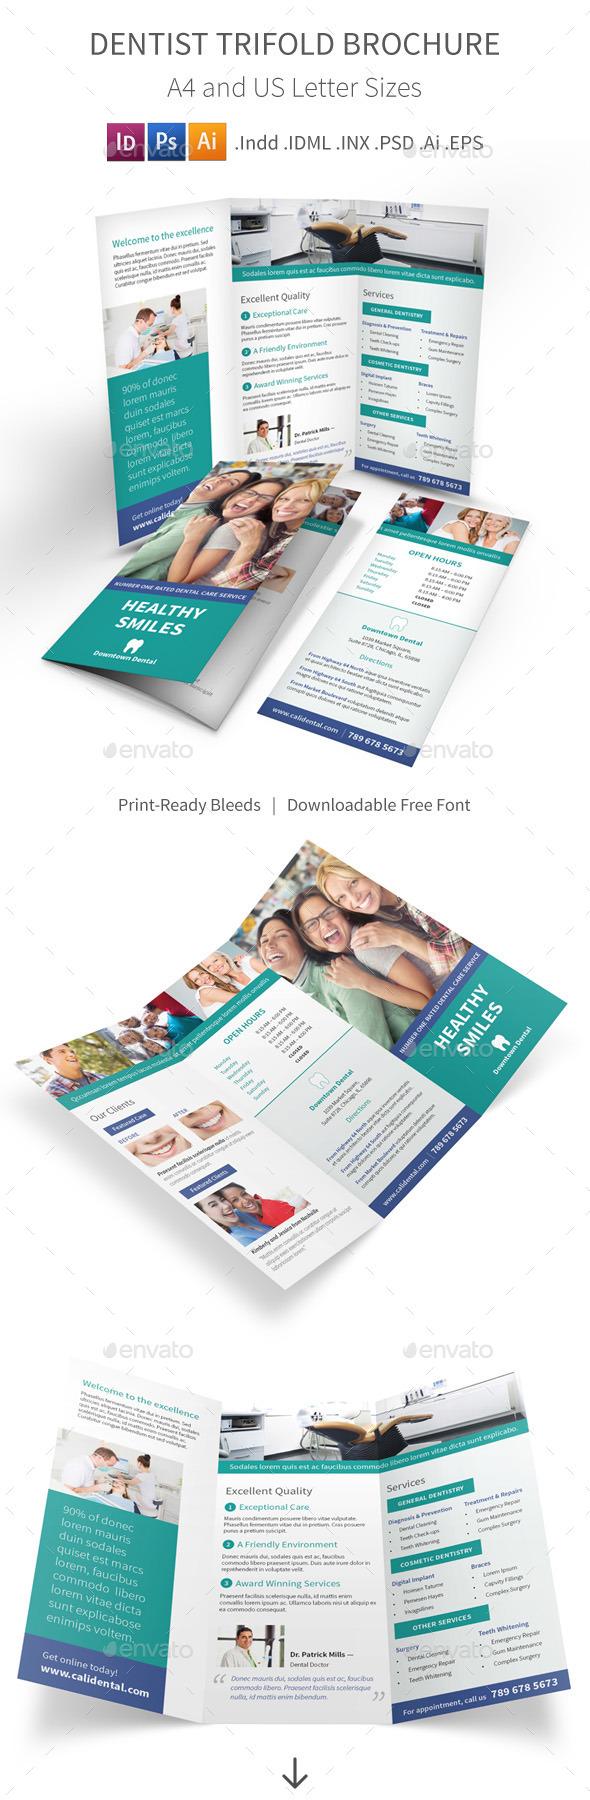 Dentist Trifold Brochure